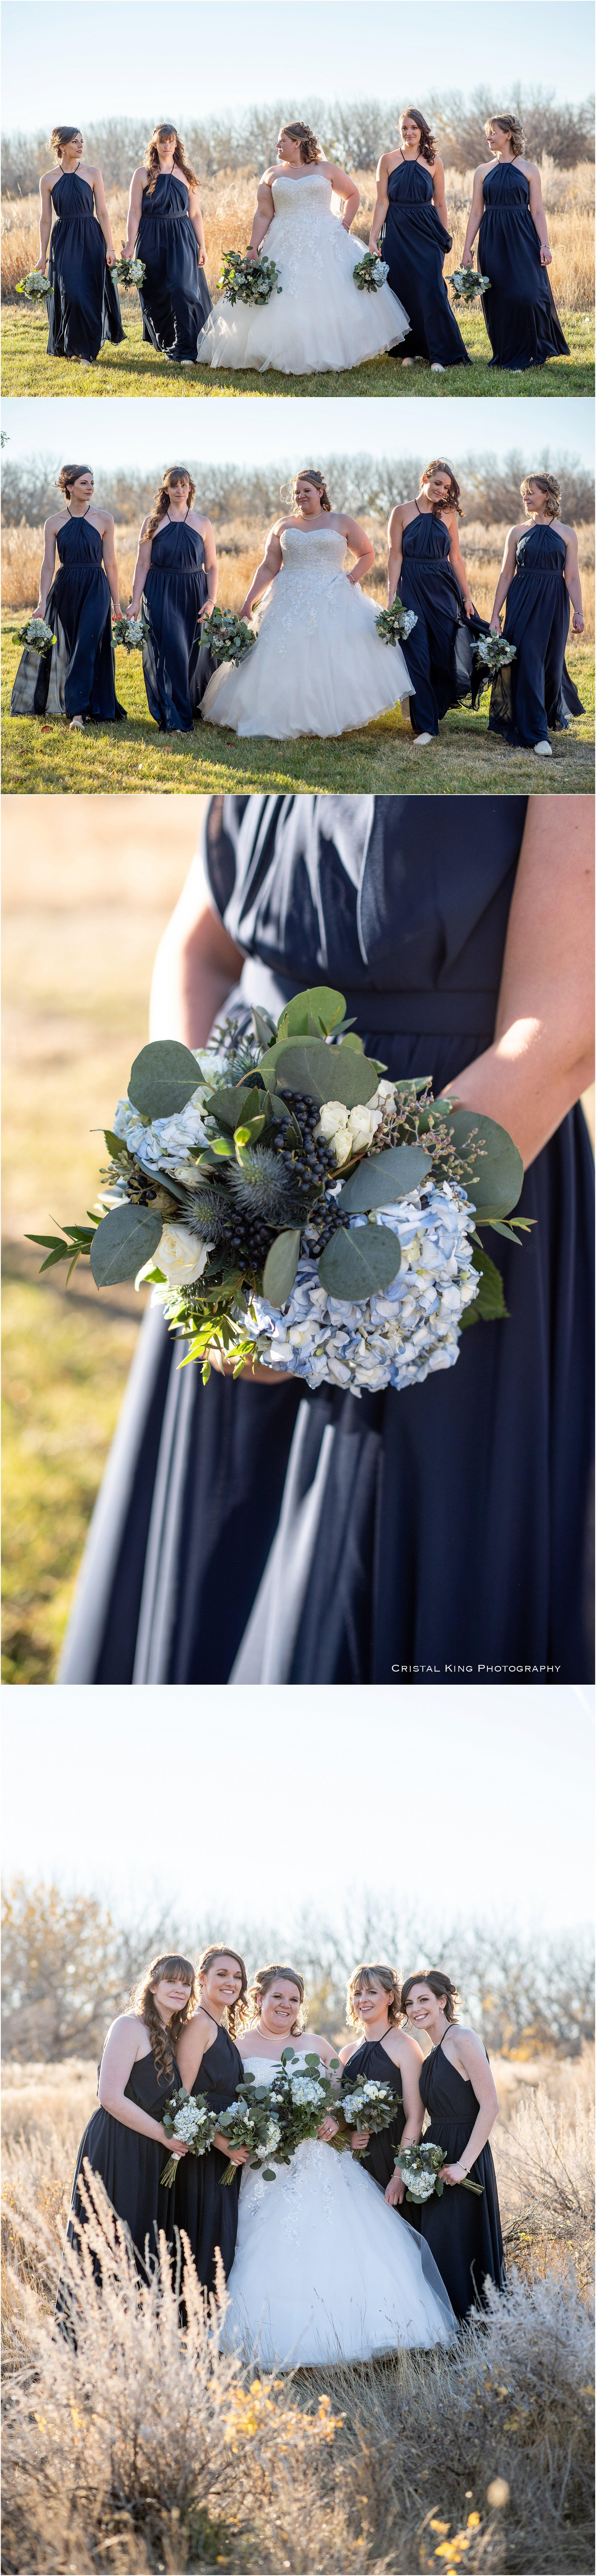 Tracy-Kyles-Wedding-132.jpg